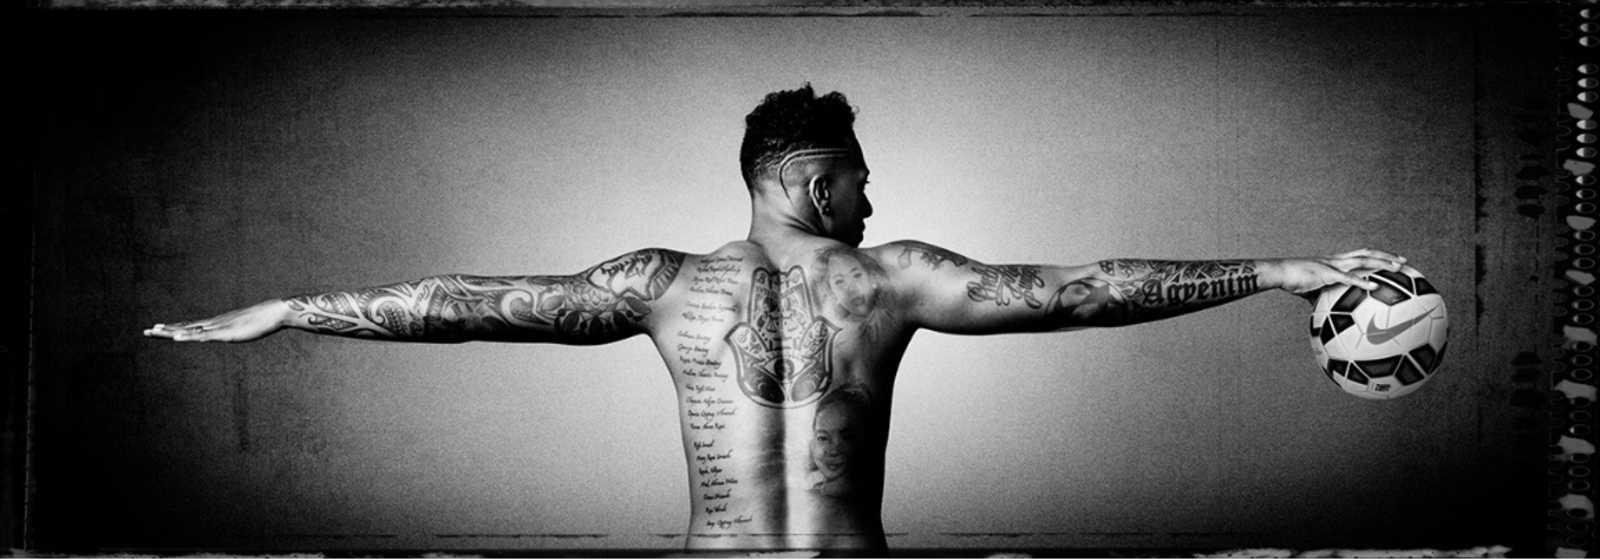 EM 44: Das crazy Tattoos der Fußball-Stars | ANTENNE BAYERN - Fussball Tattoos